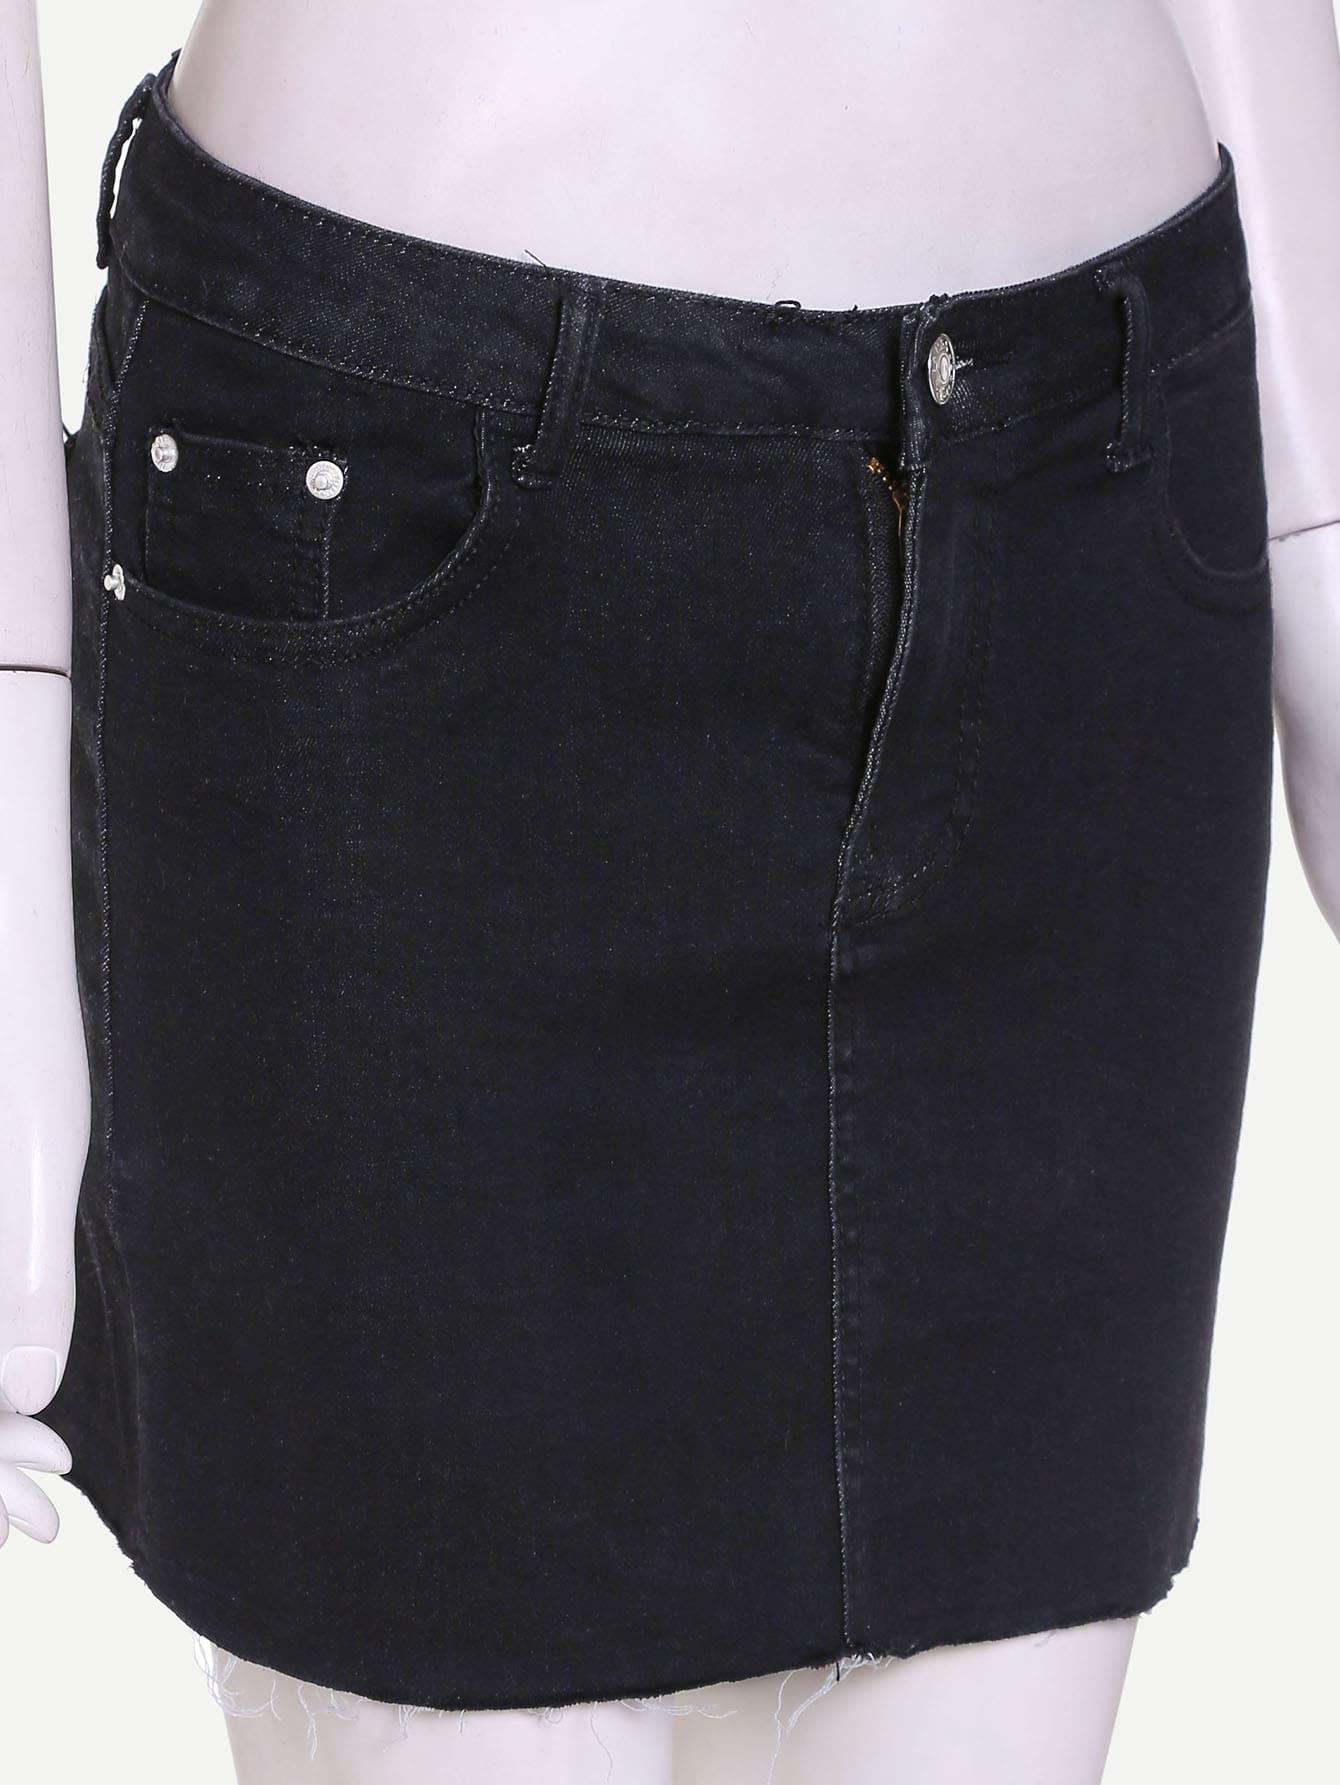 jupe moulant en jean avec poche noir french romwe. Black Bedroom Furniture Sets. Home Design Ideas